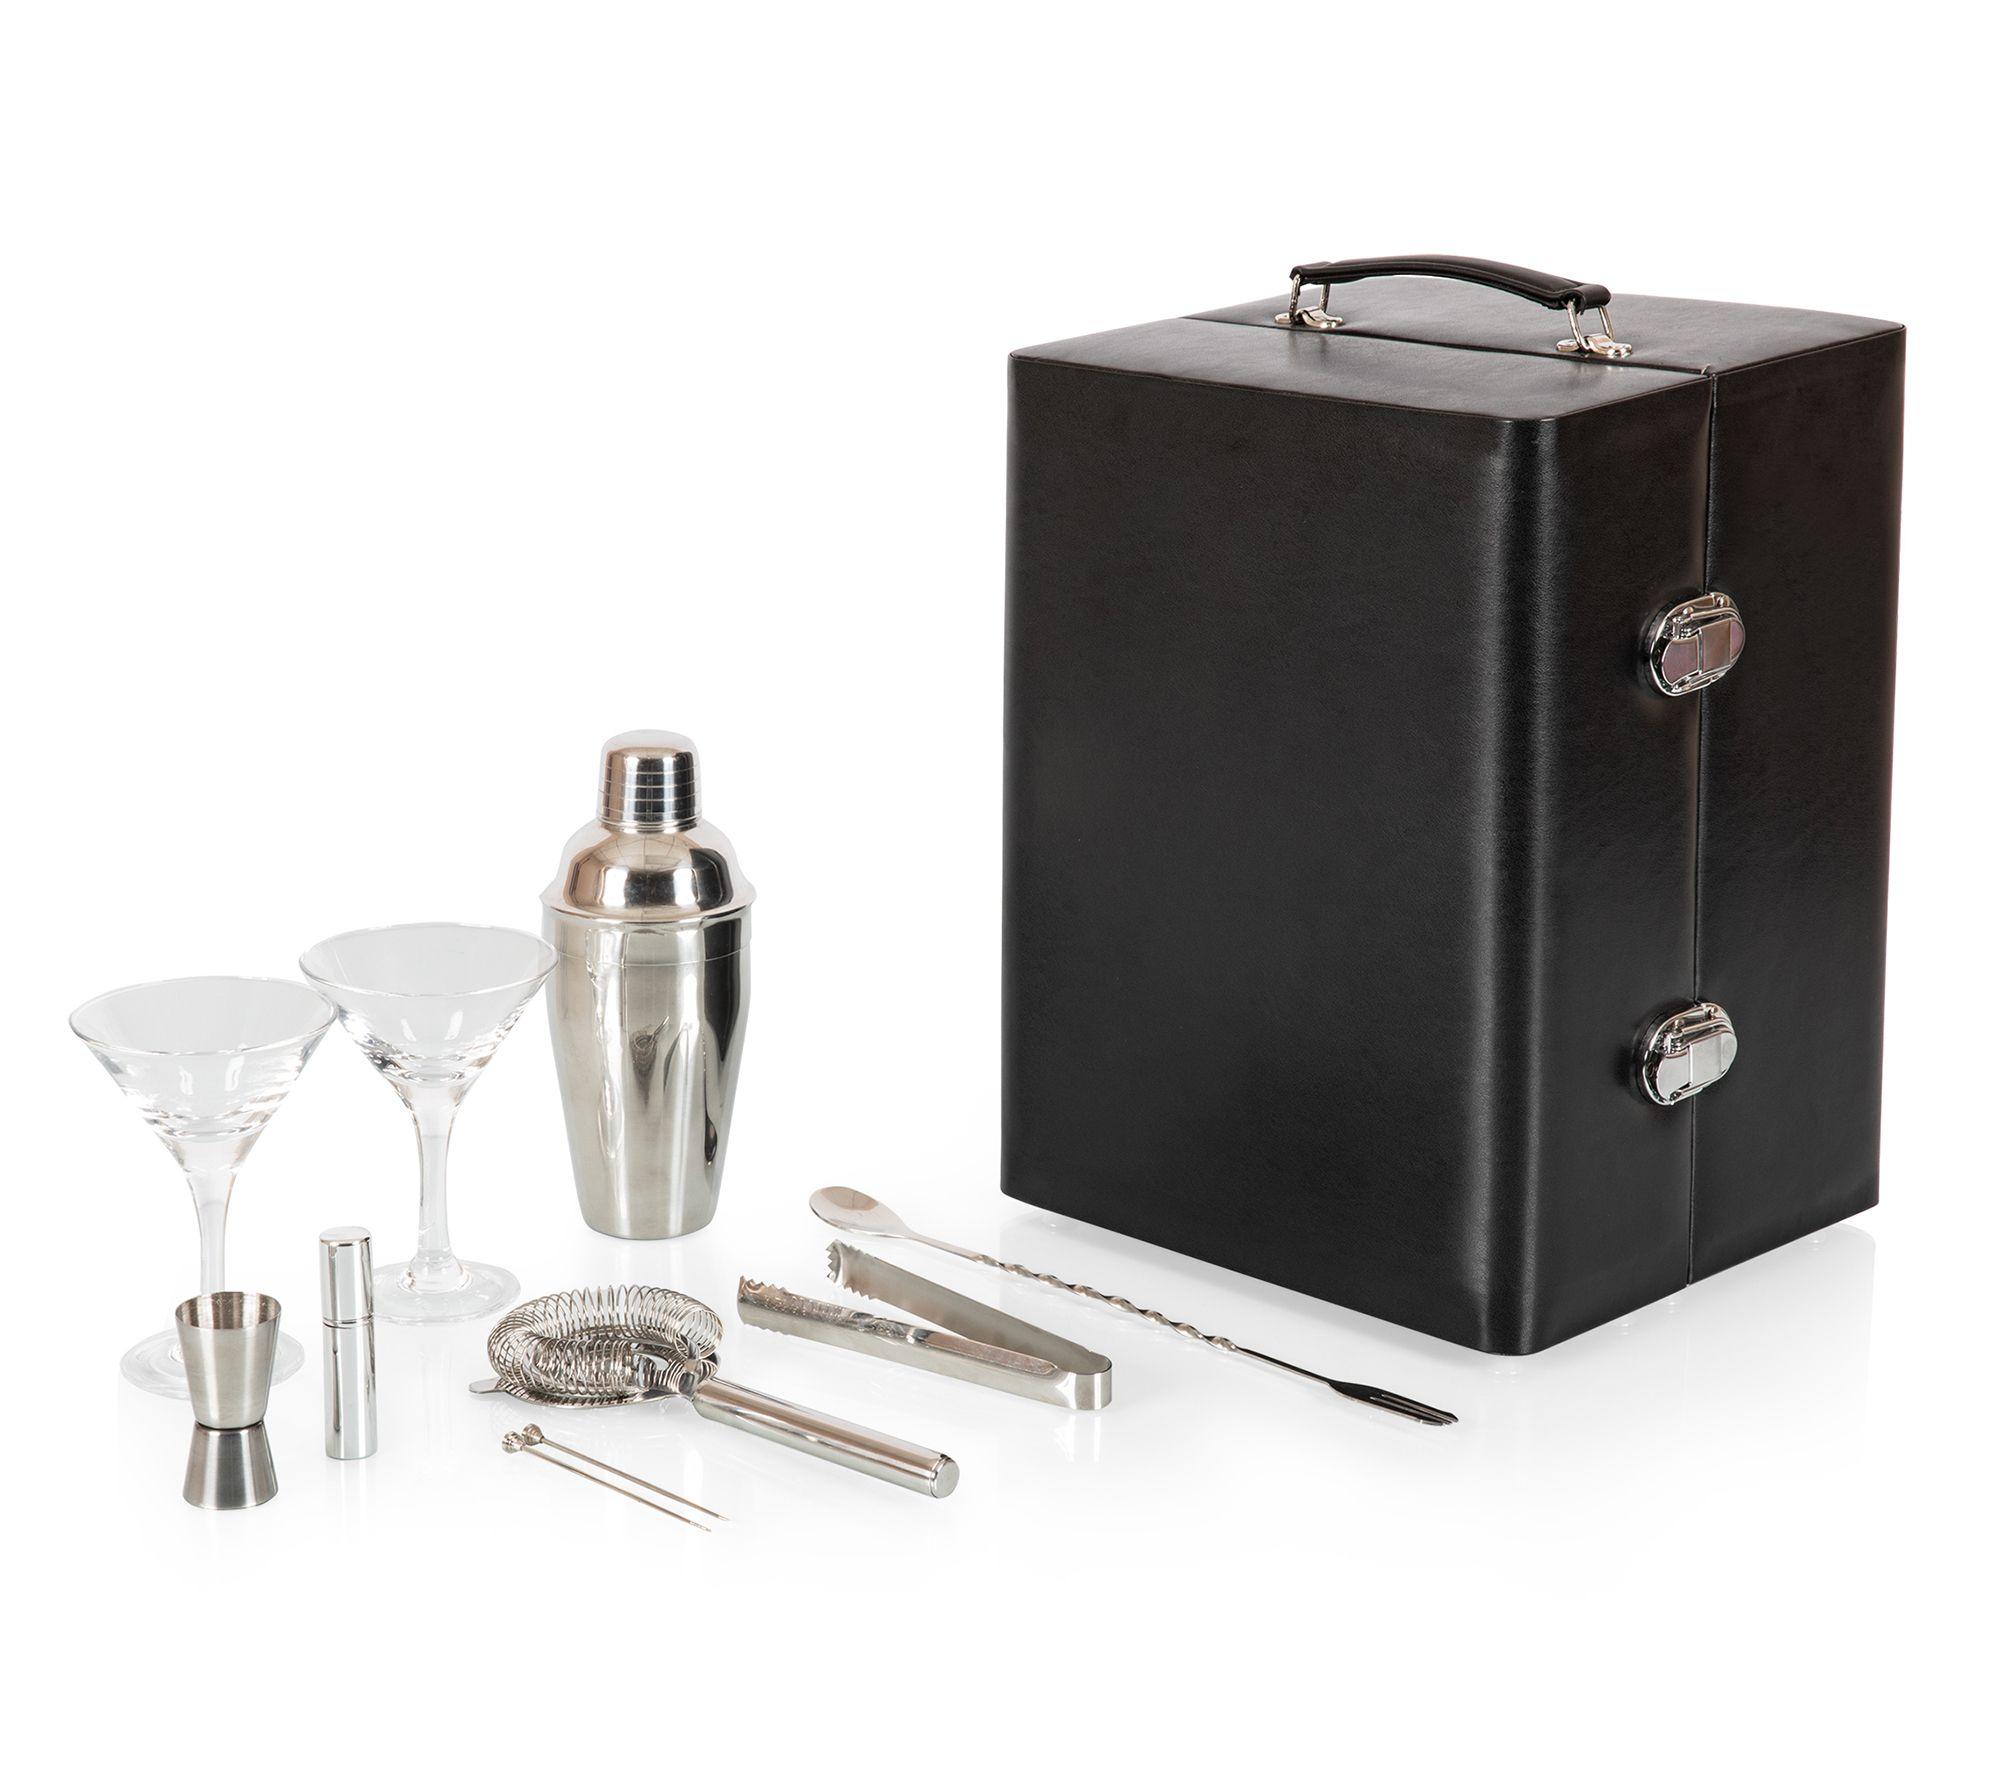 Save 15% on a Manhattan cocktail case